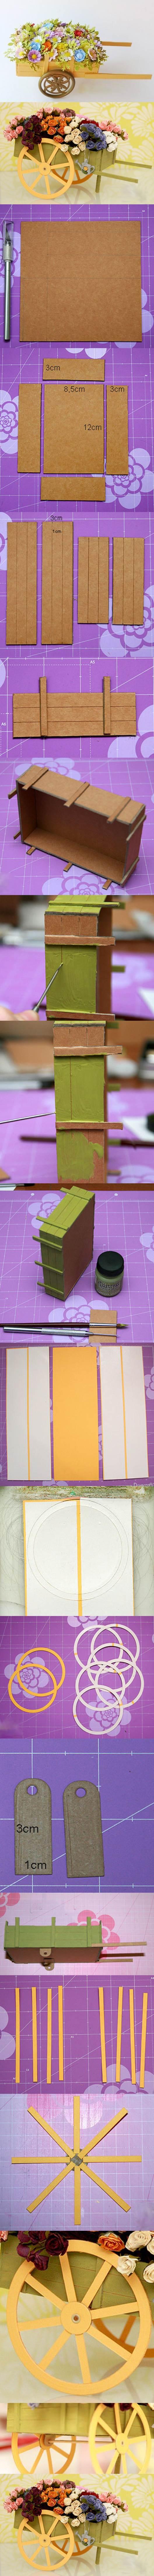 cardboard wegon making